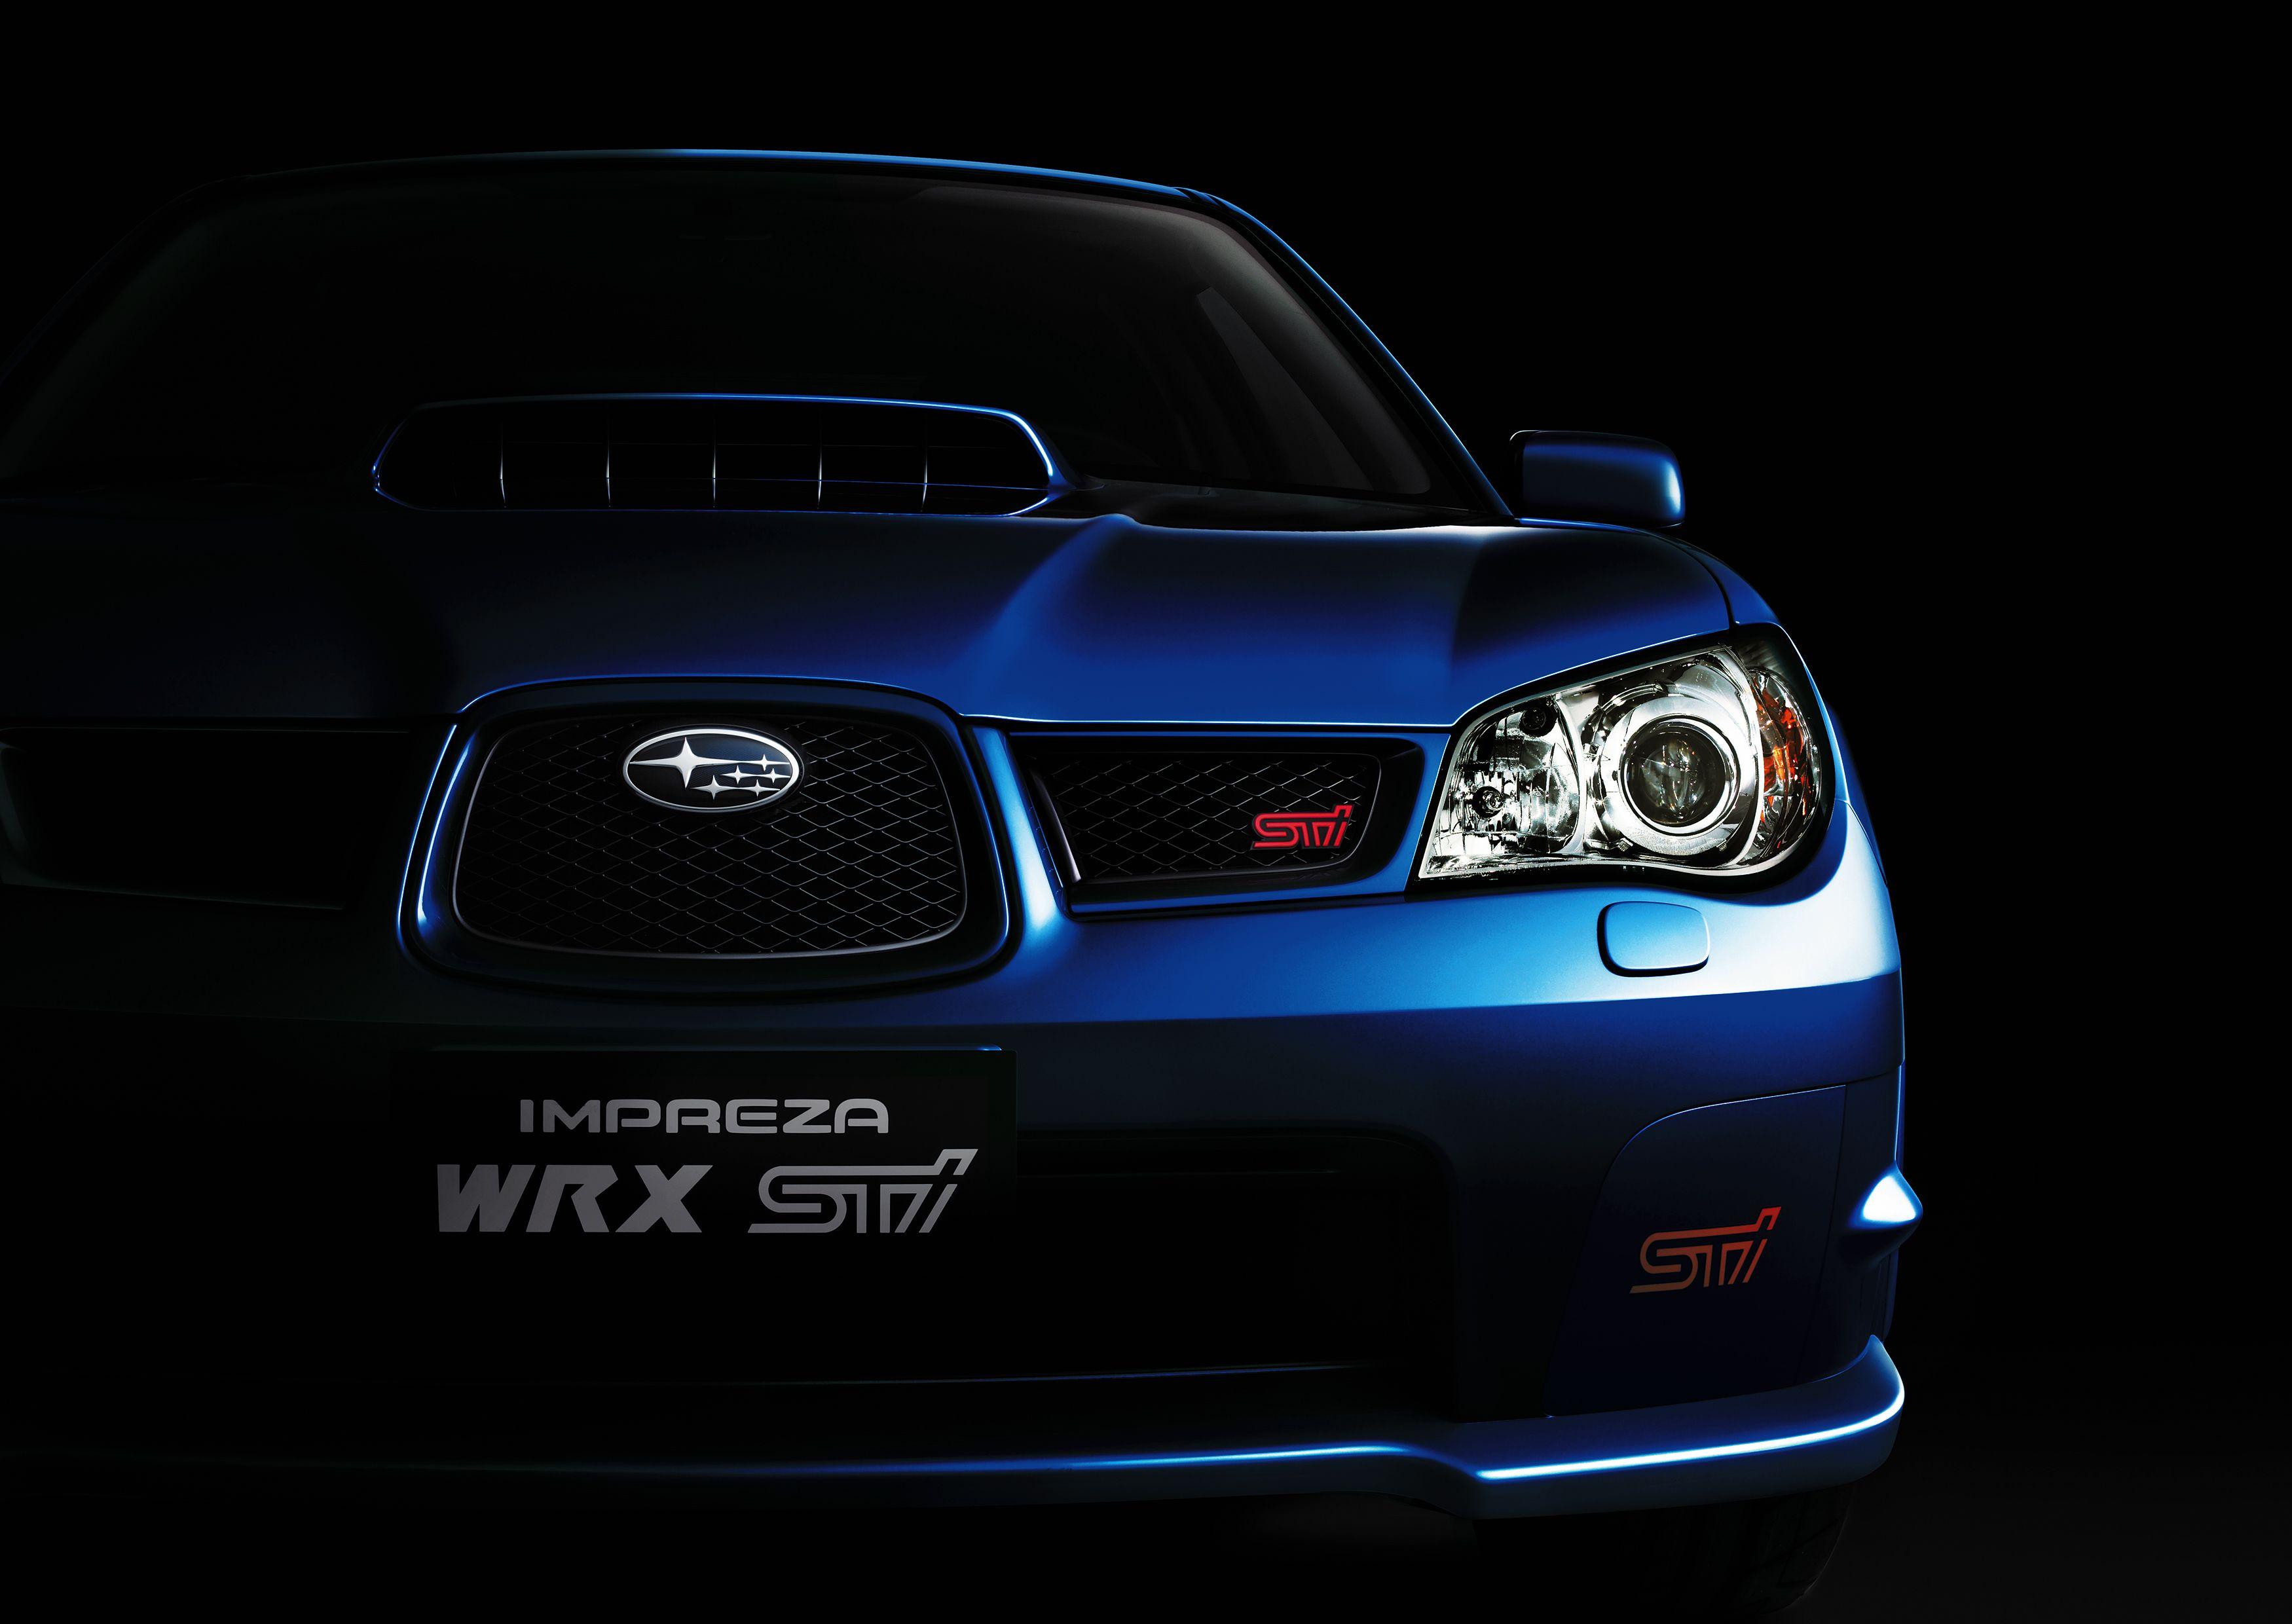 Subaru Impreza wallpaper | 3500x2480 | 122025 | WallpaperUP